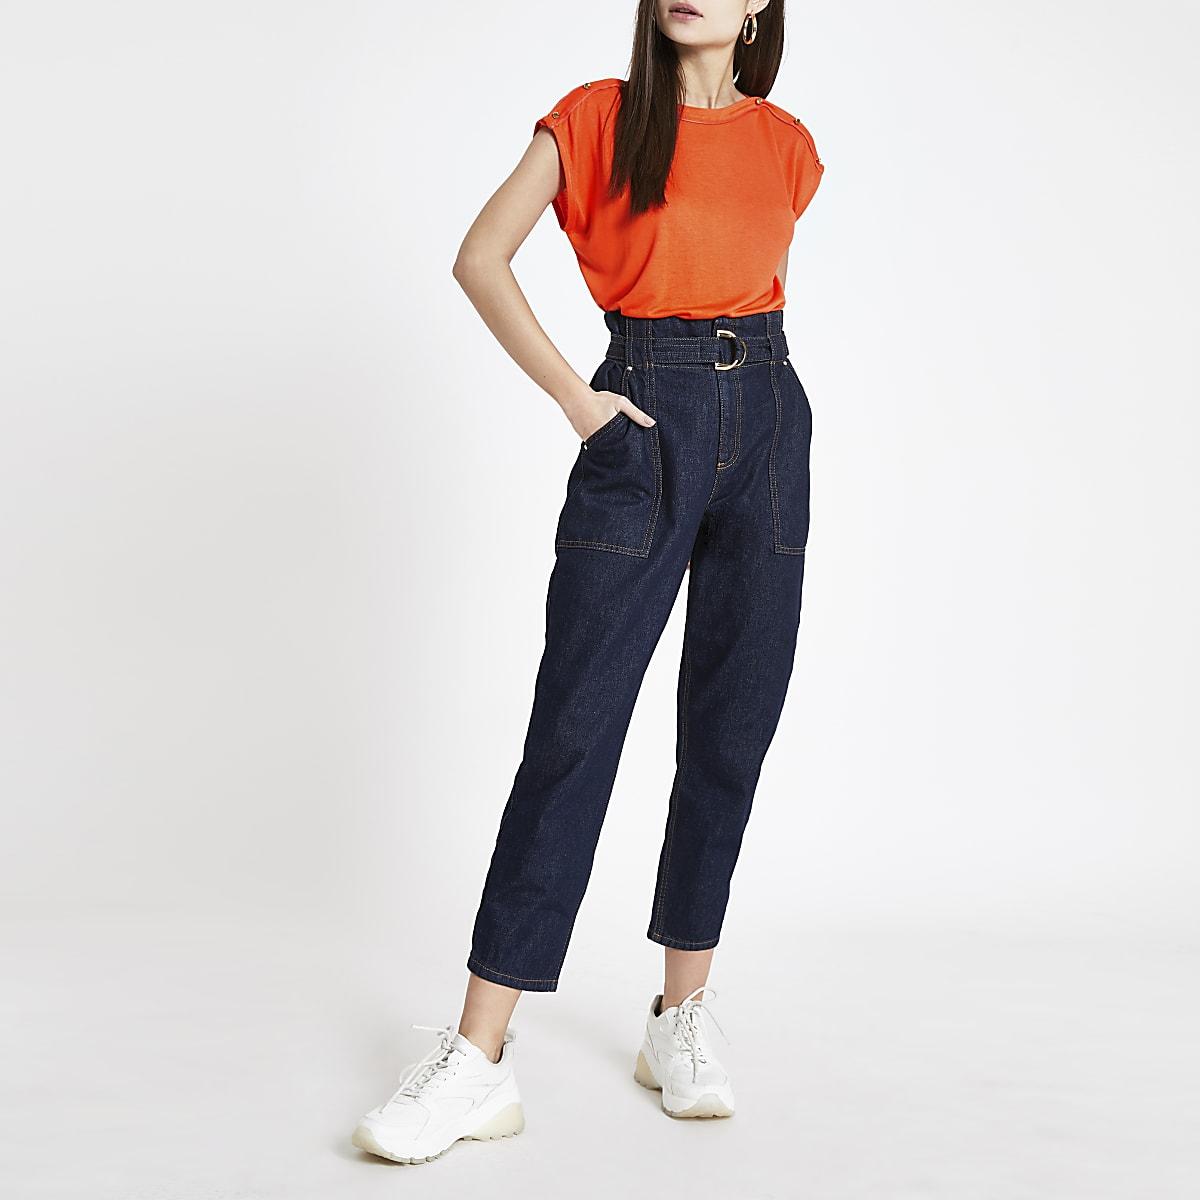 Oranje T-shirt met sierknopen